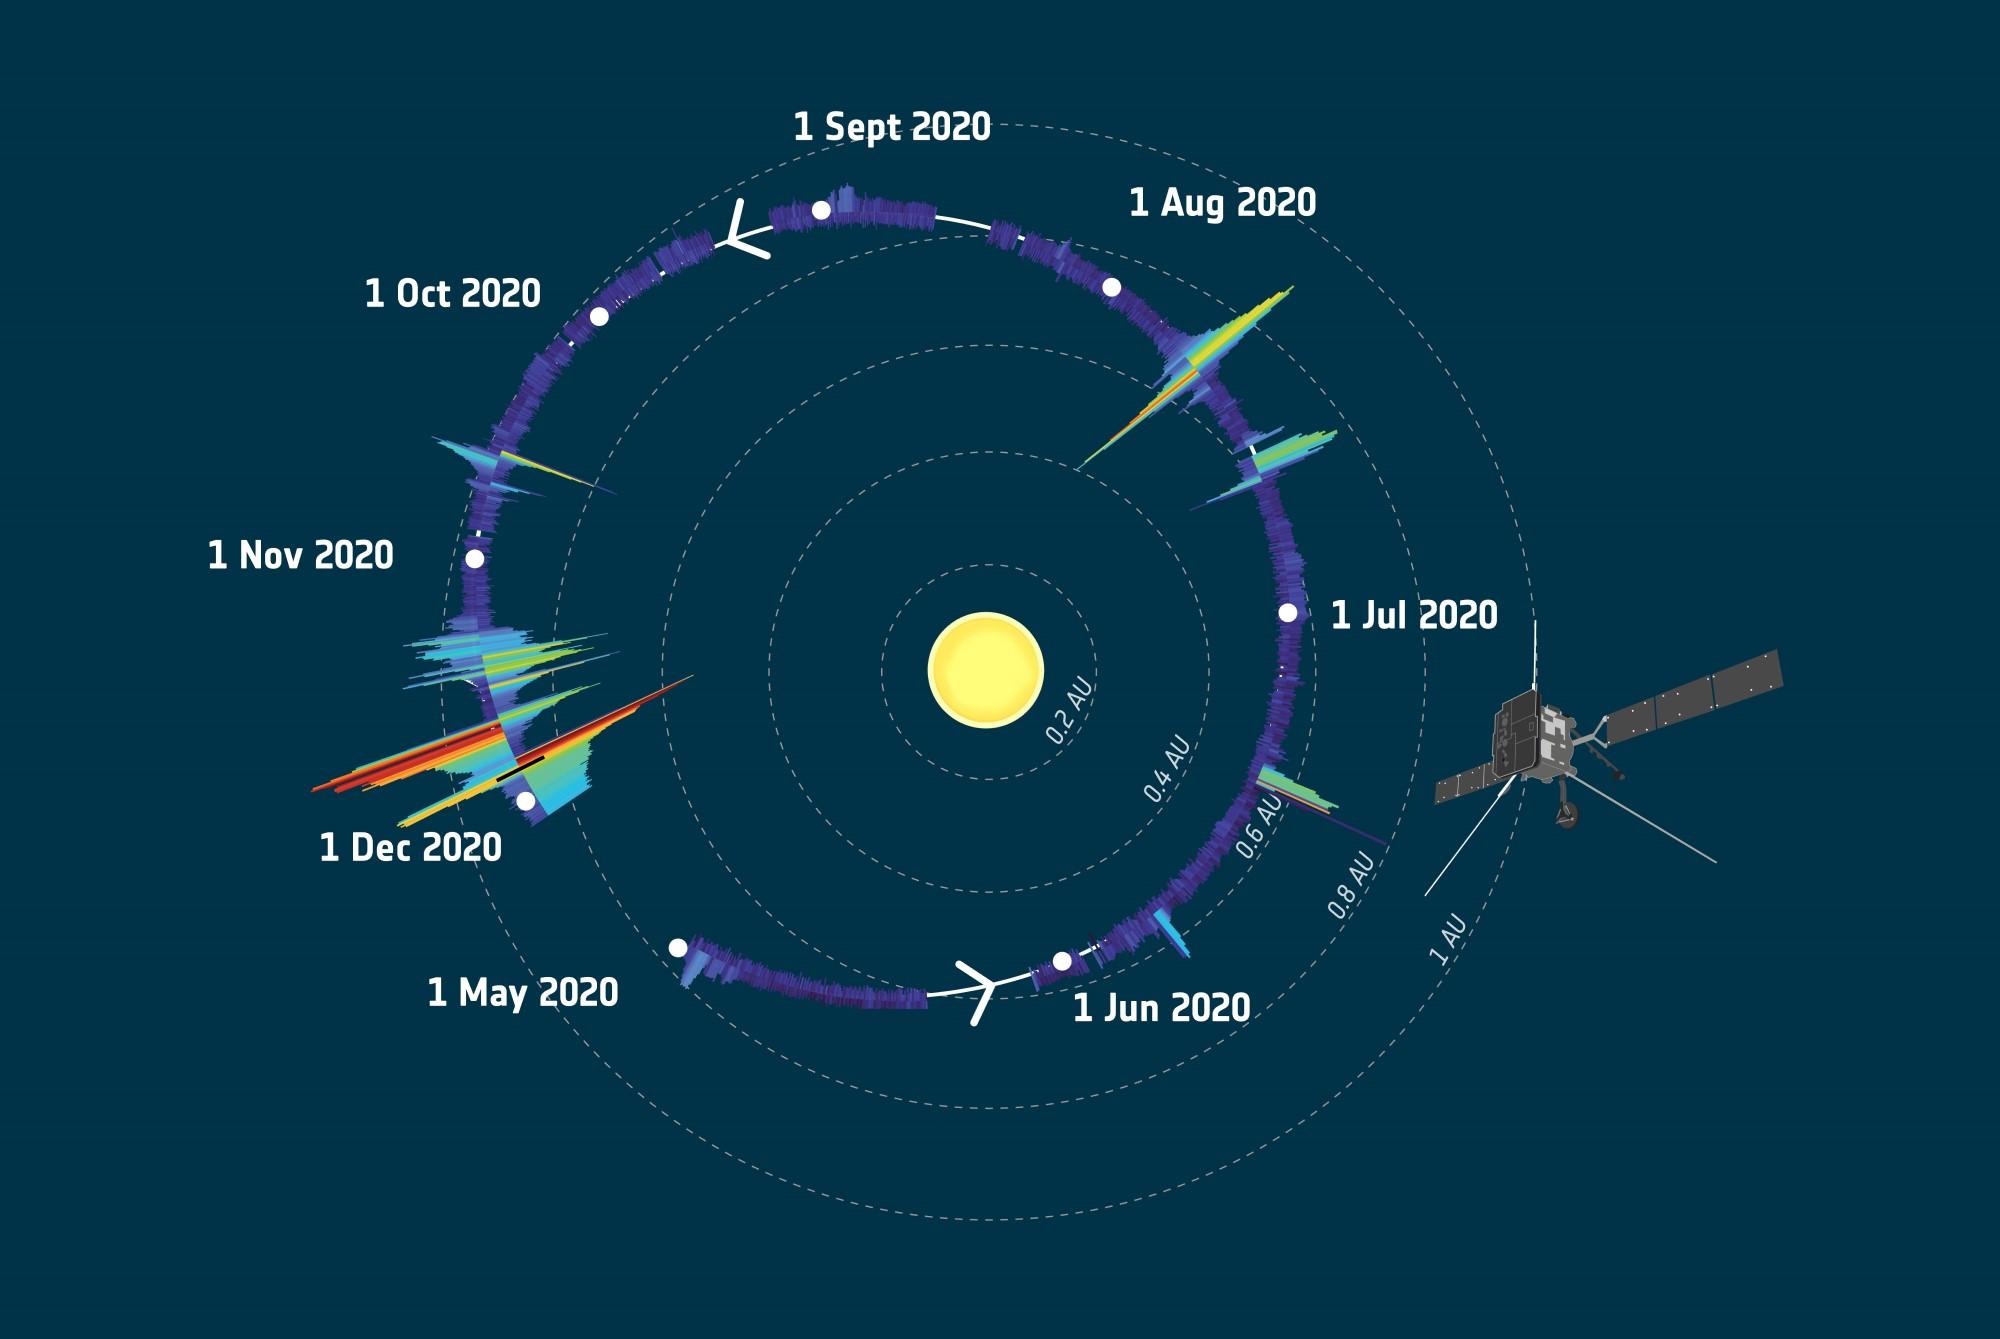 ESA_SolarOrbiter_EPD_2020_2k.jpg